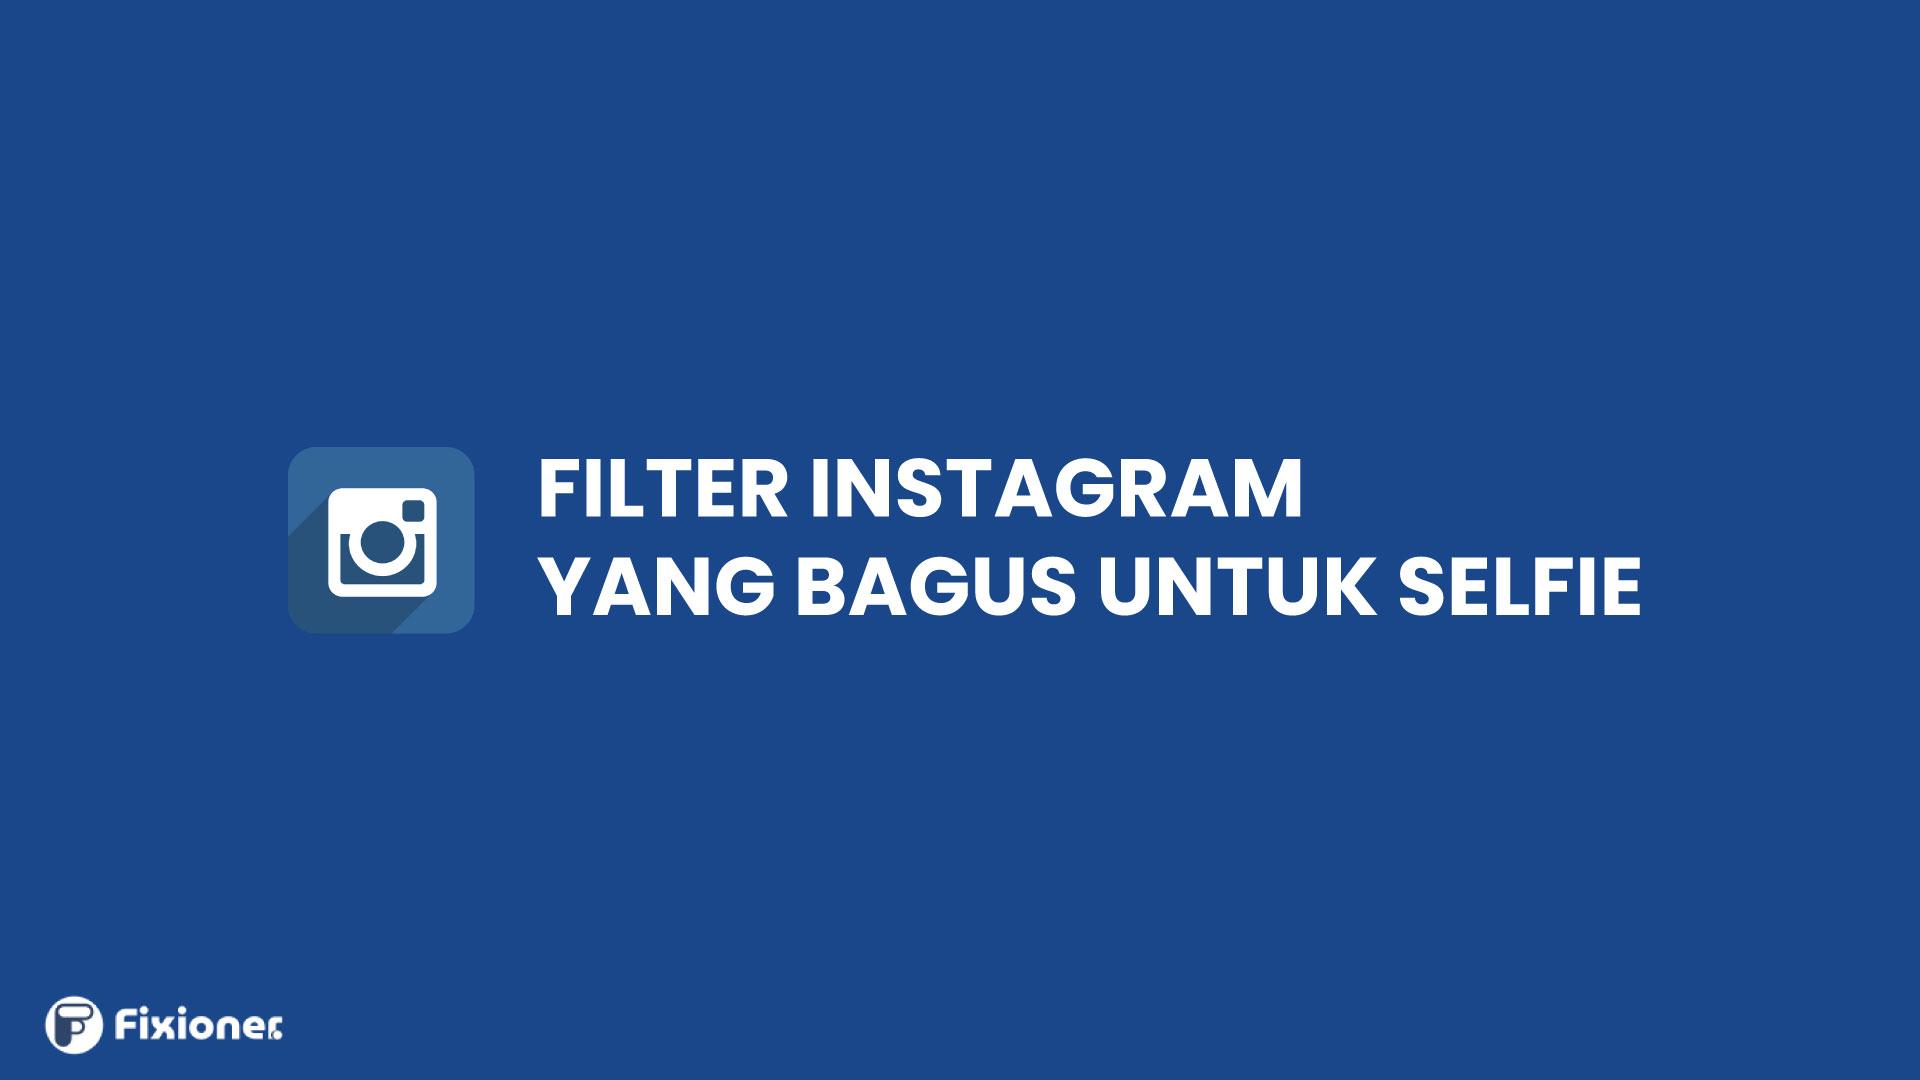 filter Instagram yang bagus untuk selfie